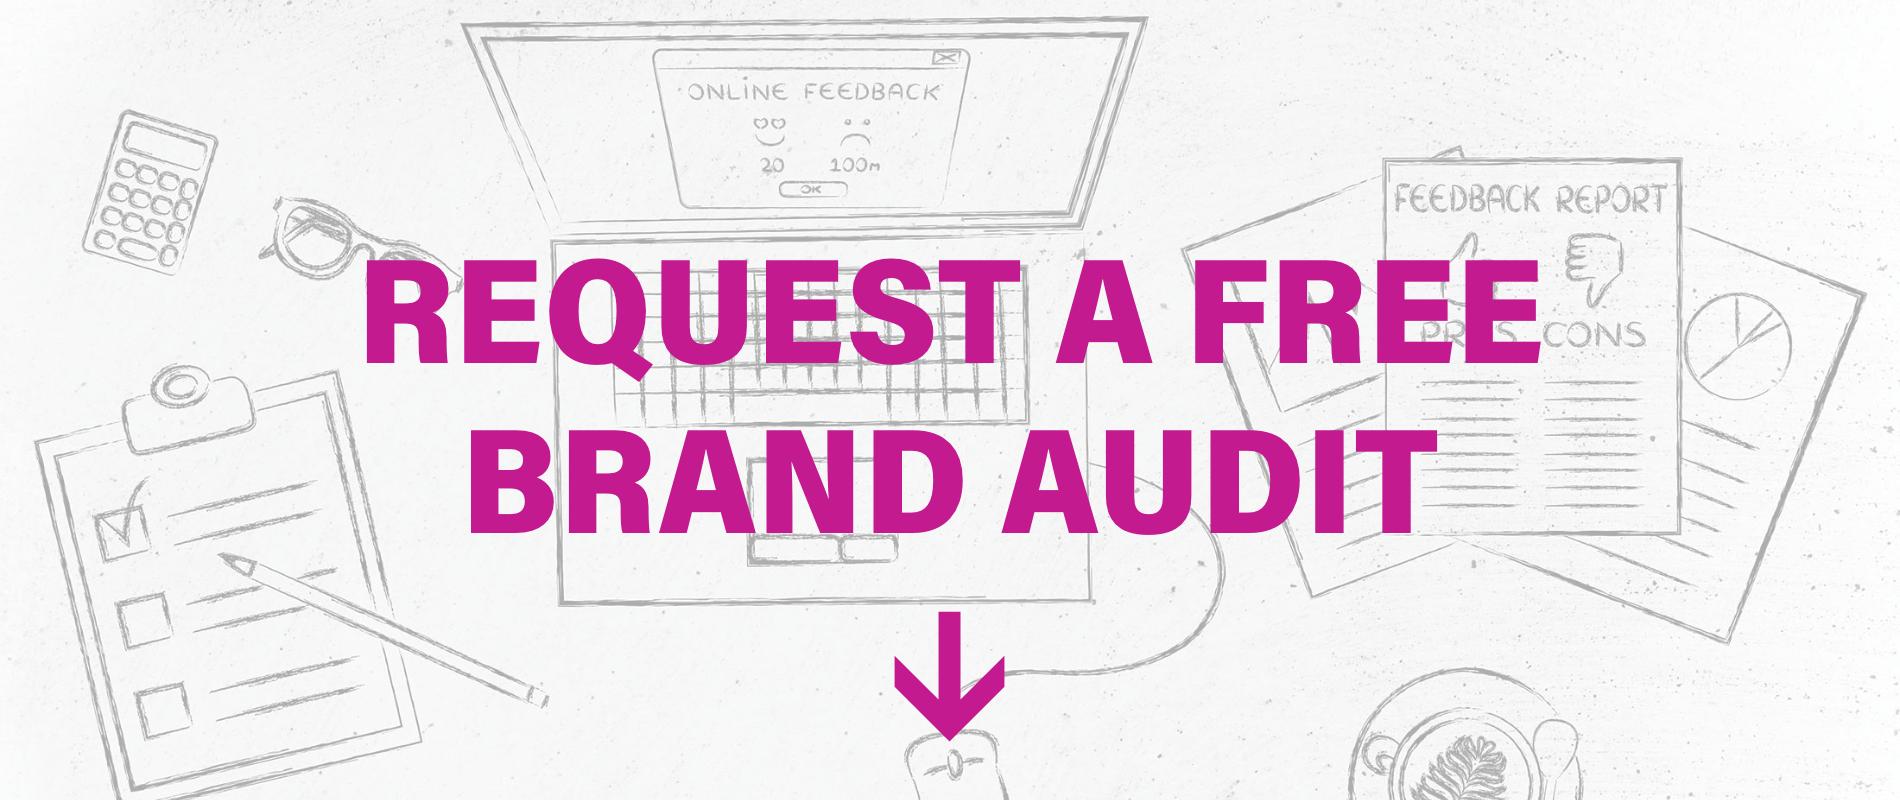 Digital Marketing Agency - Request A Free Brand Audit